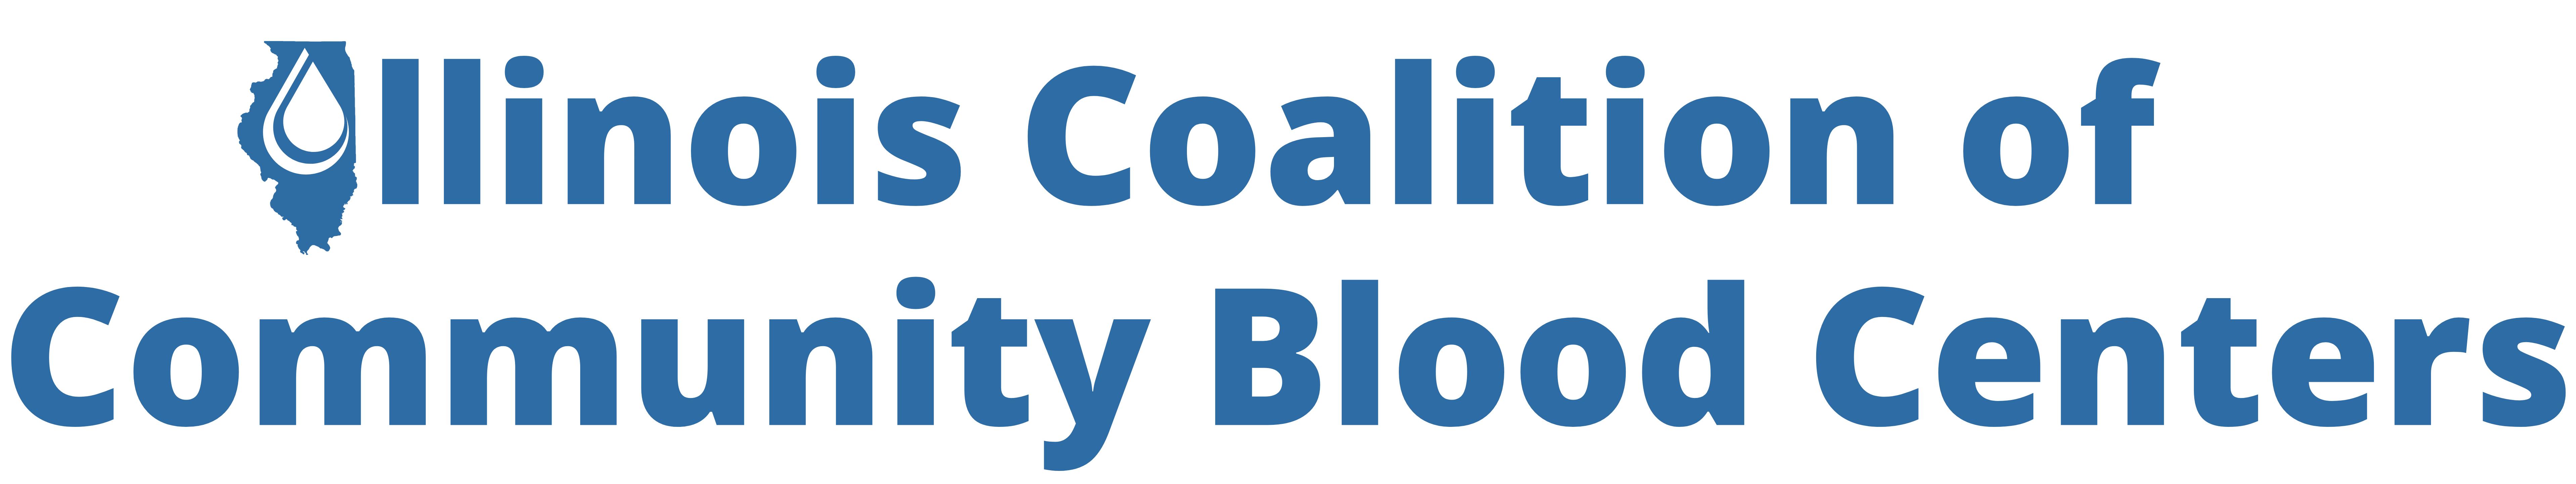 Illinois Coalition of Community Blood Centers